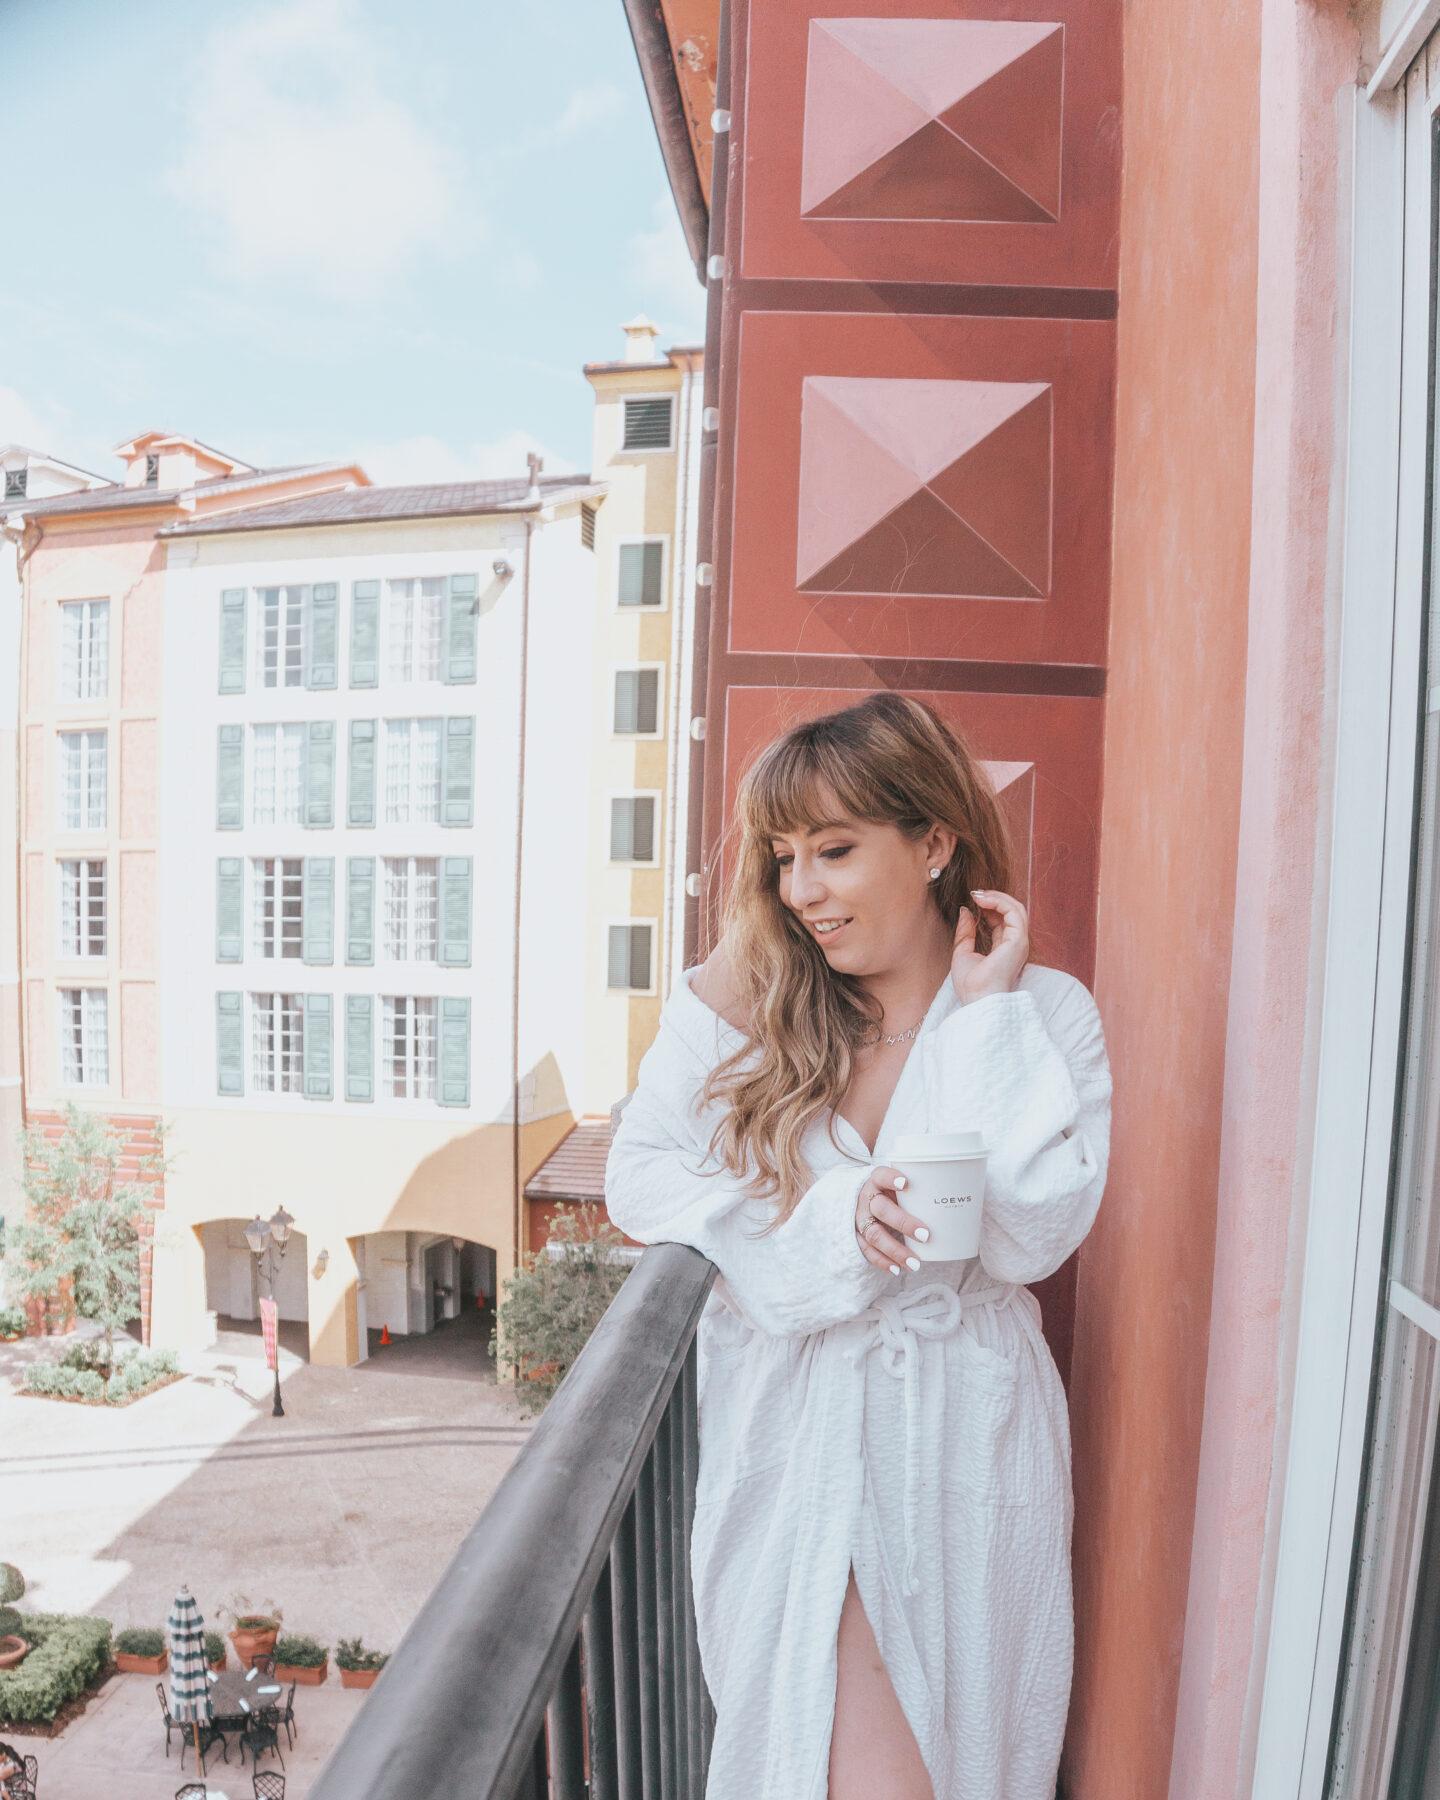 Loews-Portofino-Bay-Room-Stephanie-Pernas-10